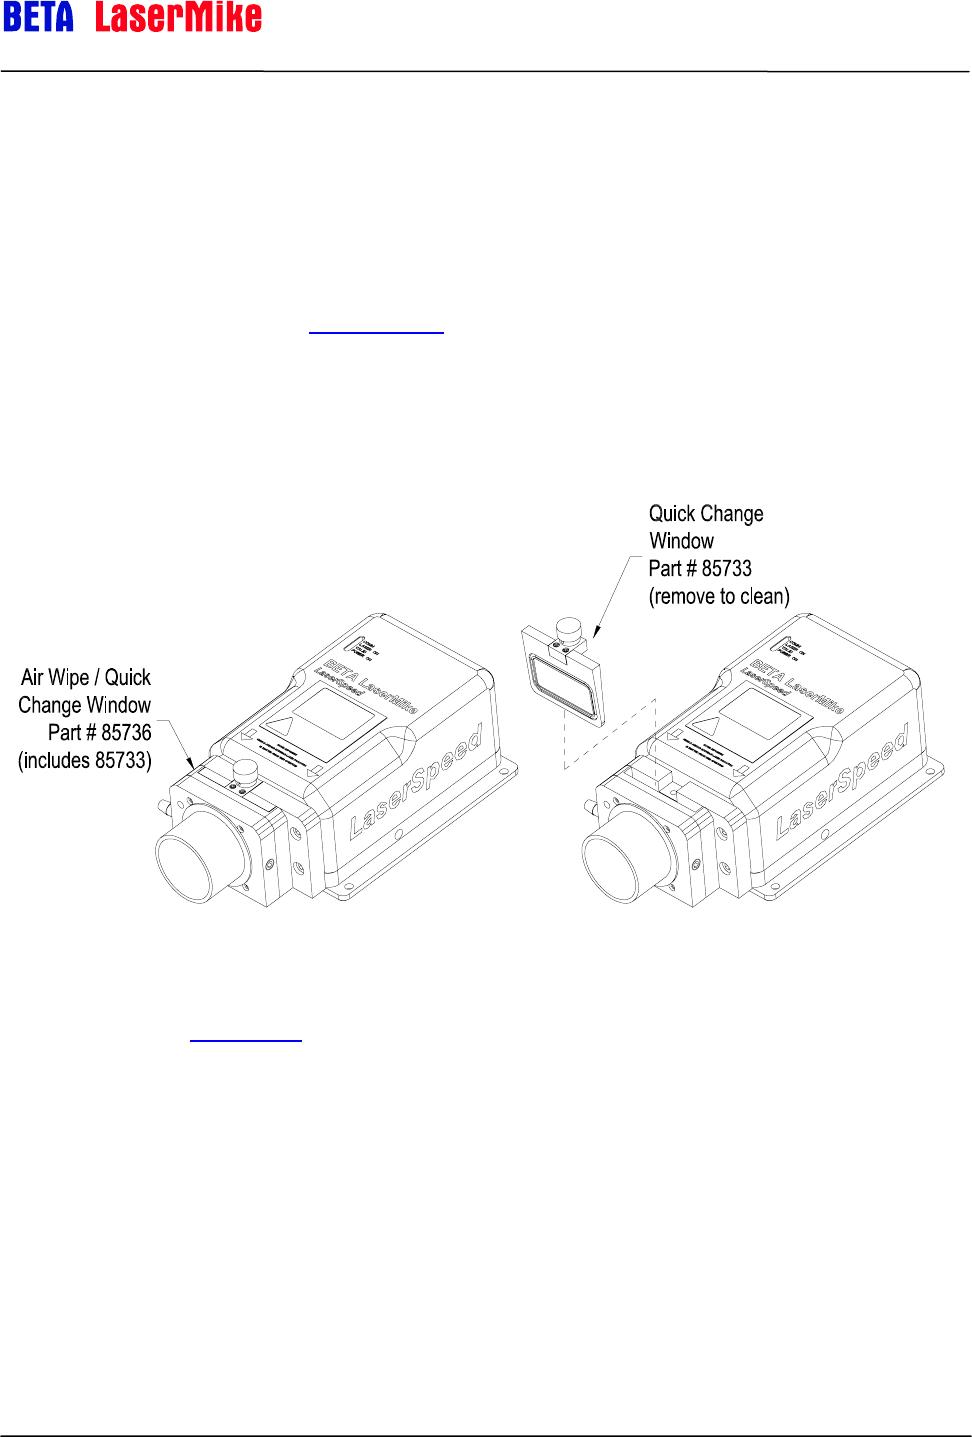 Laser Beta Lasermike Ls8000 3 Users Manual 0921 01561